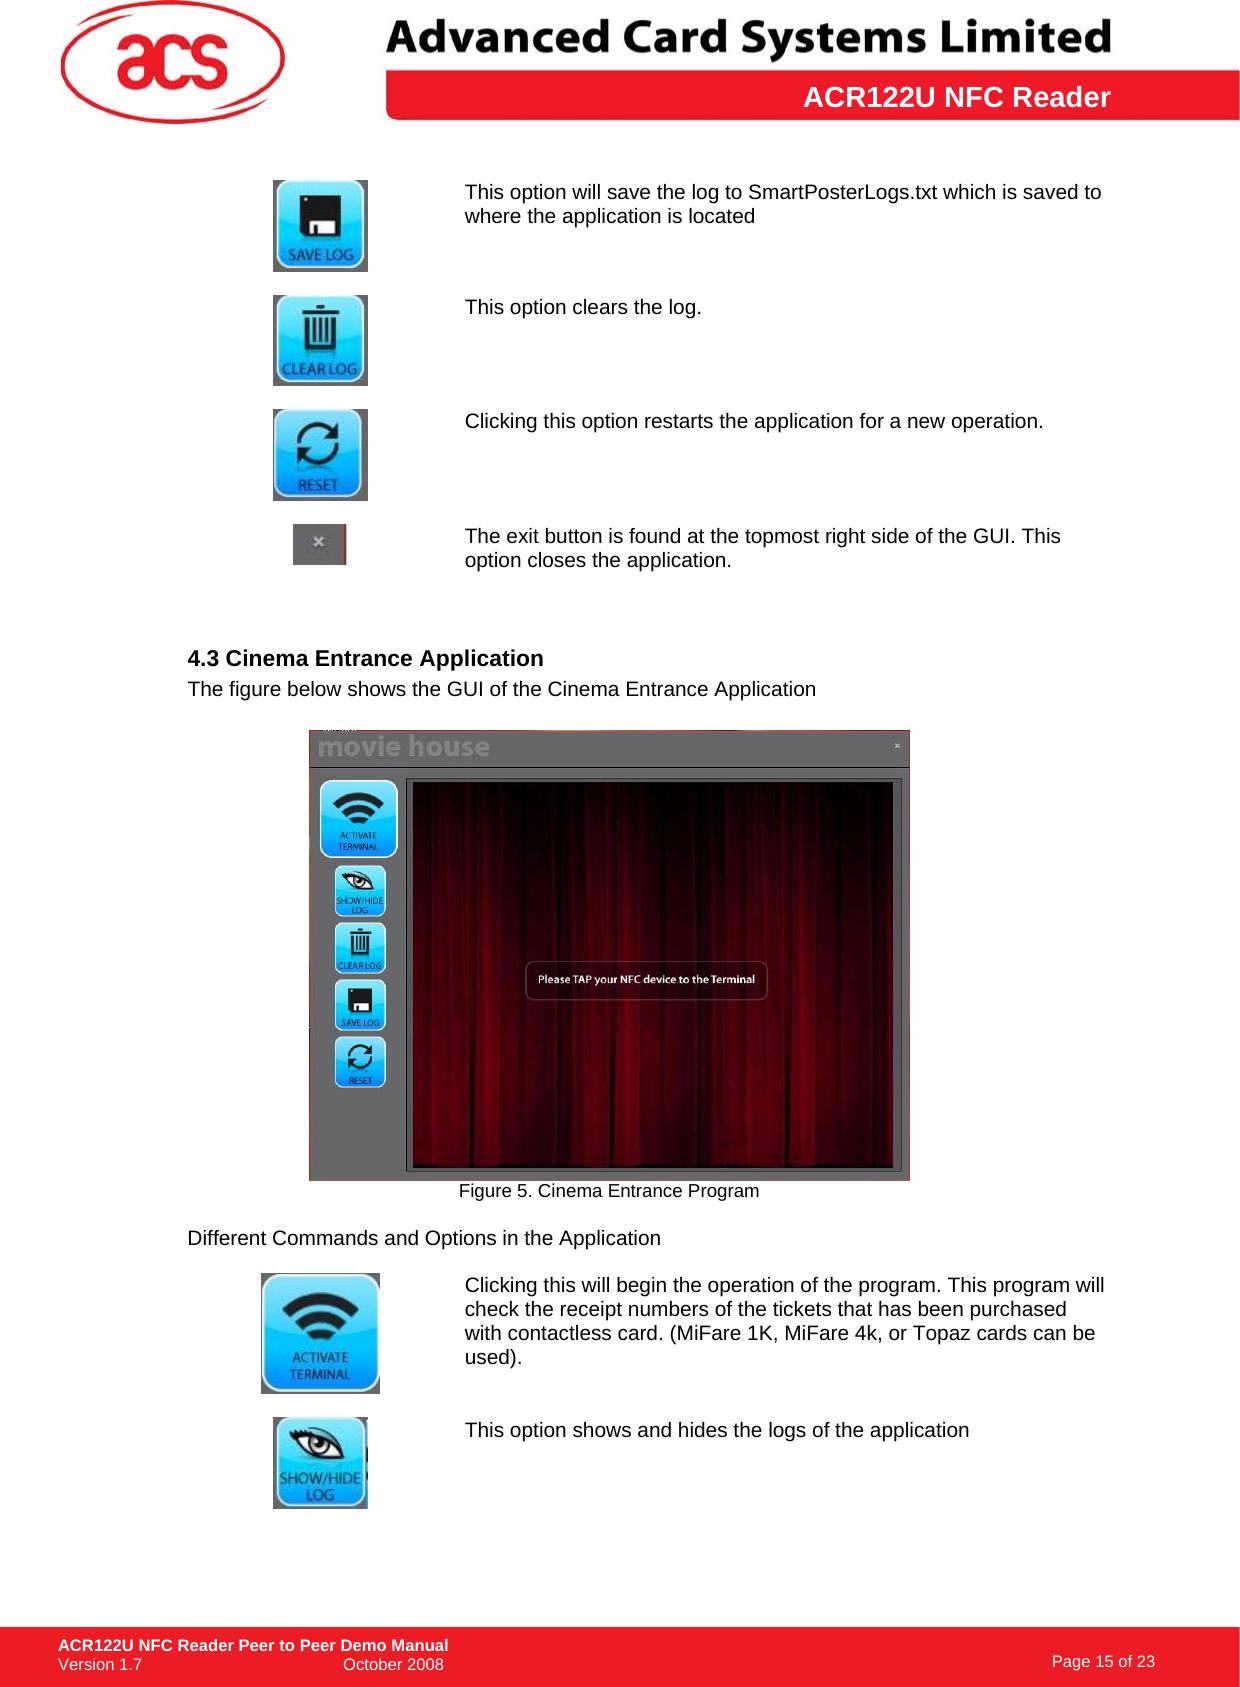 ACR122U NFC Reader Peer To Demo Manual_v1 7 P2P Manual